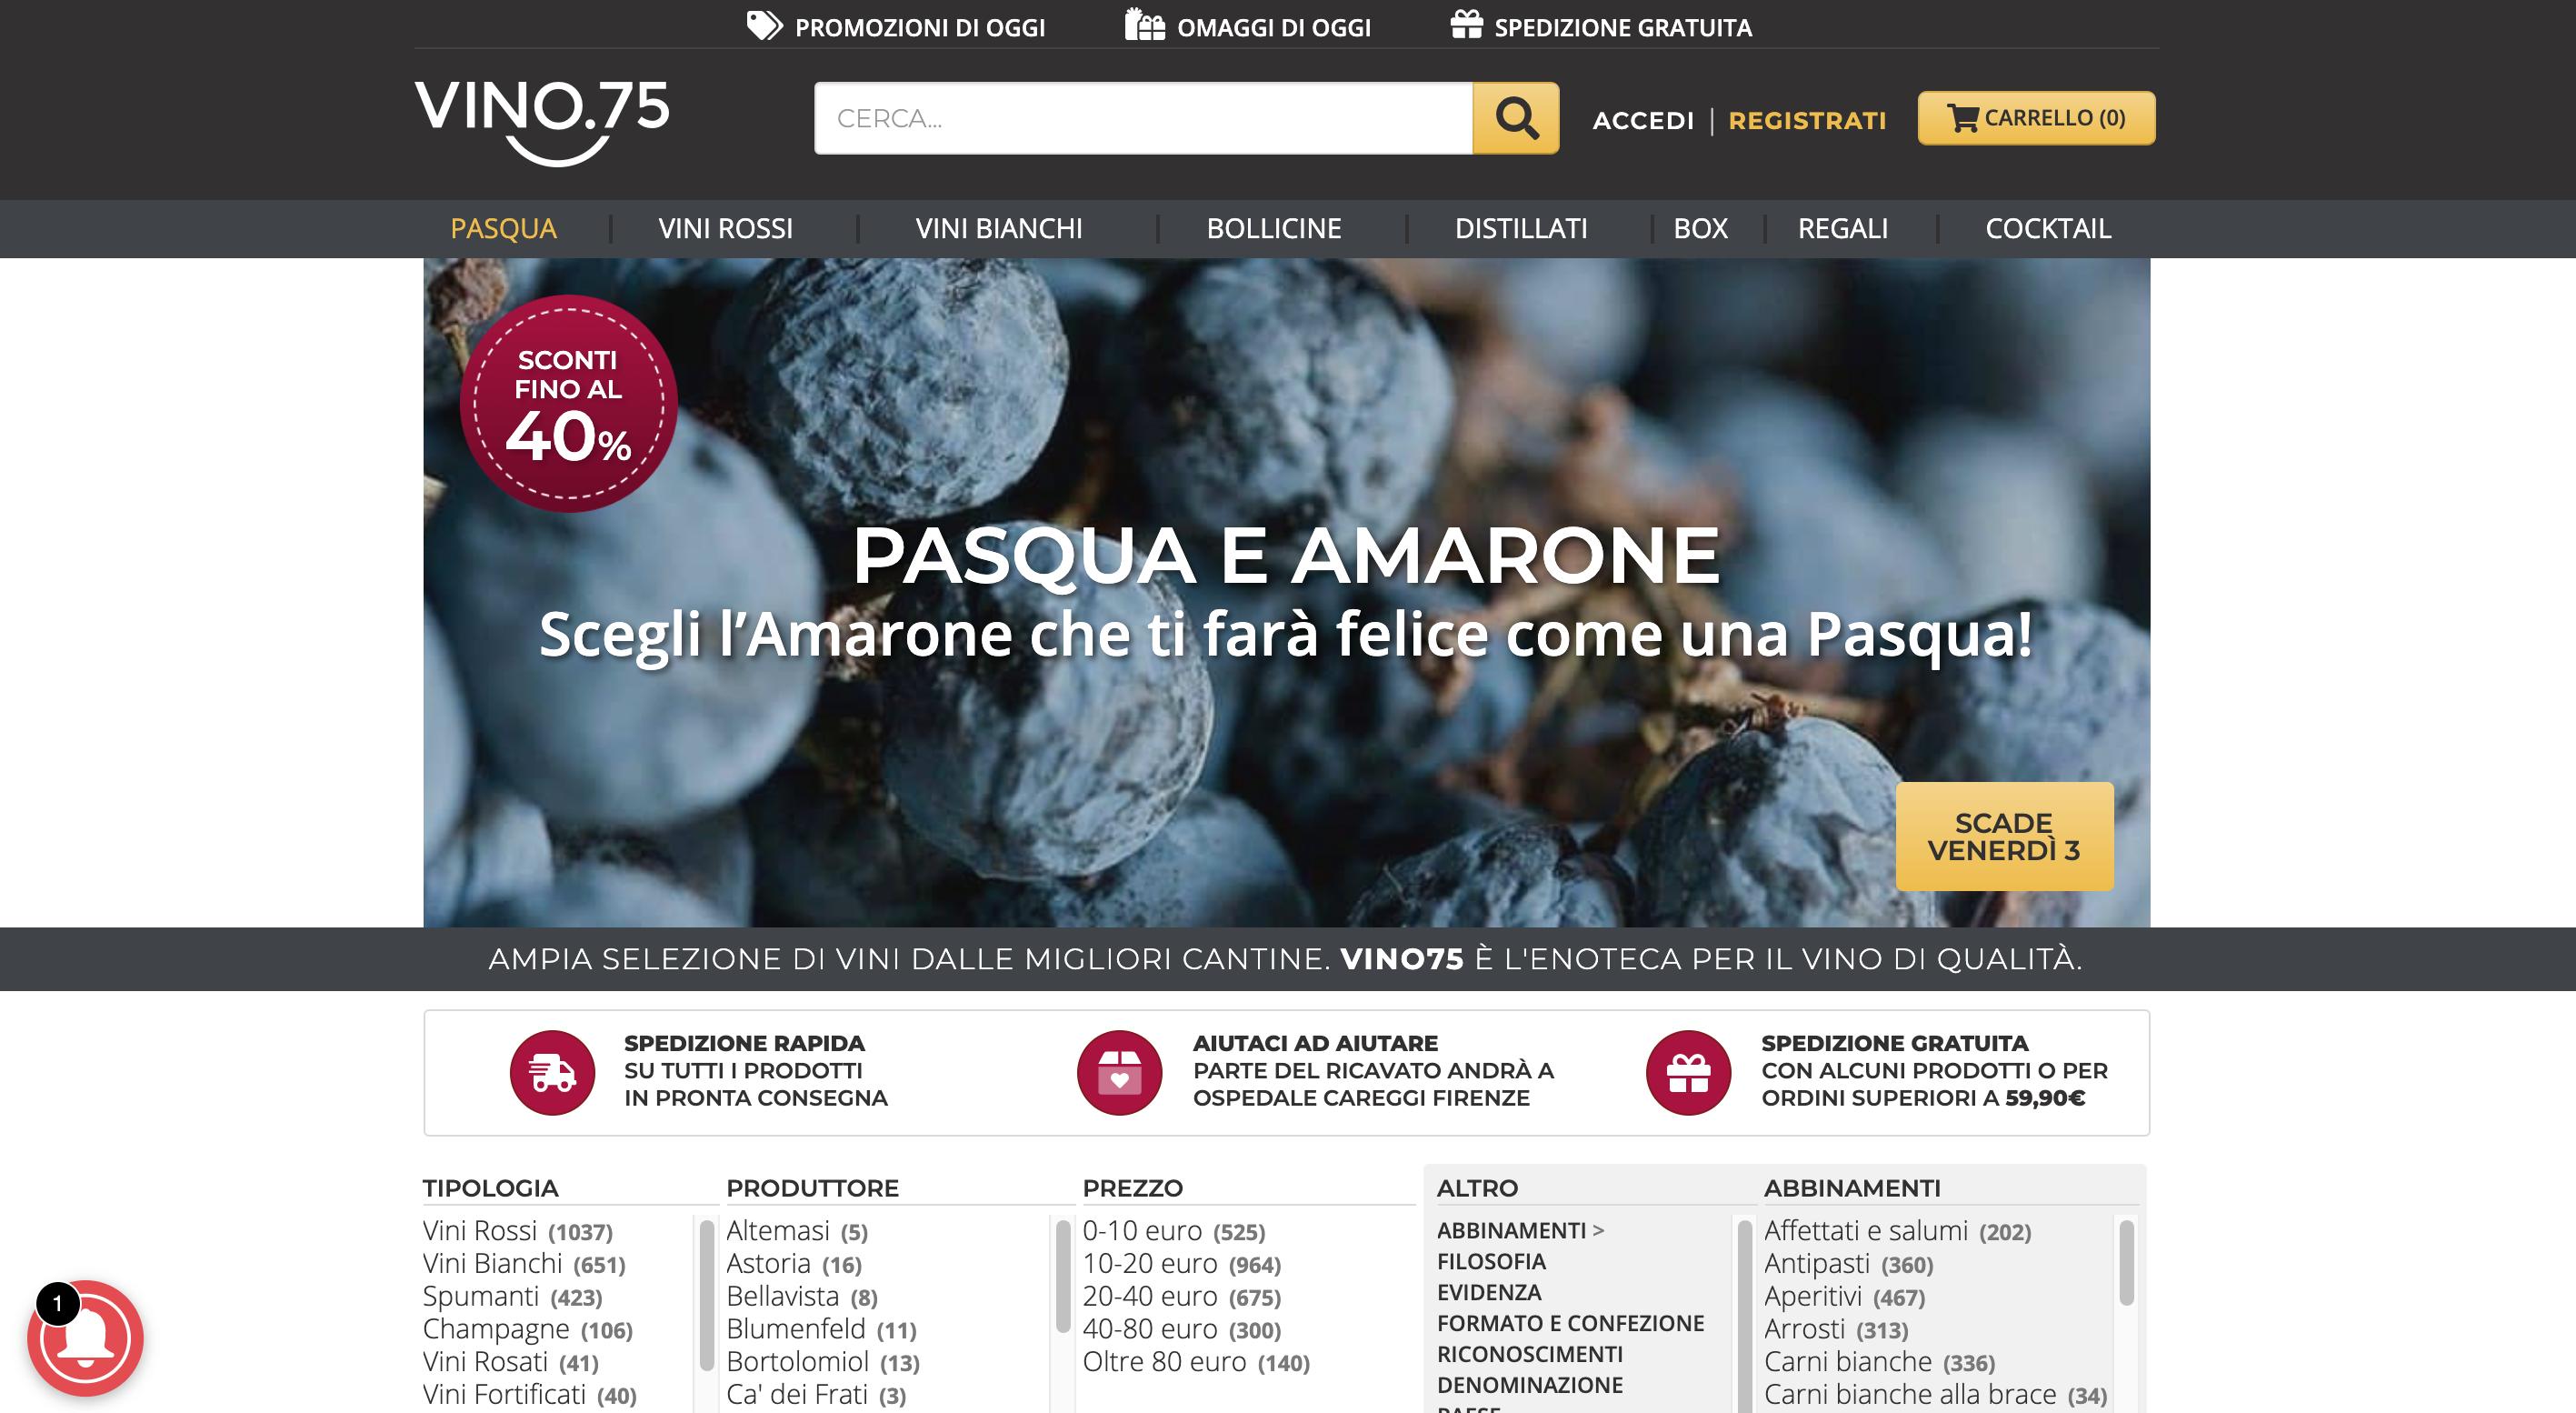 Vino75 Vino online